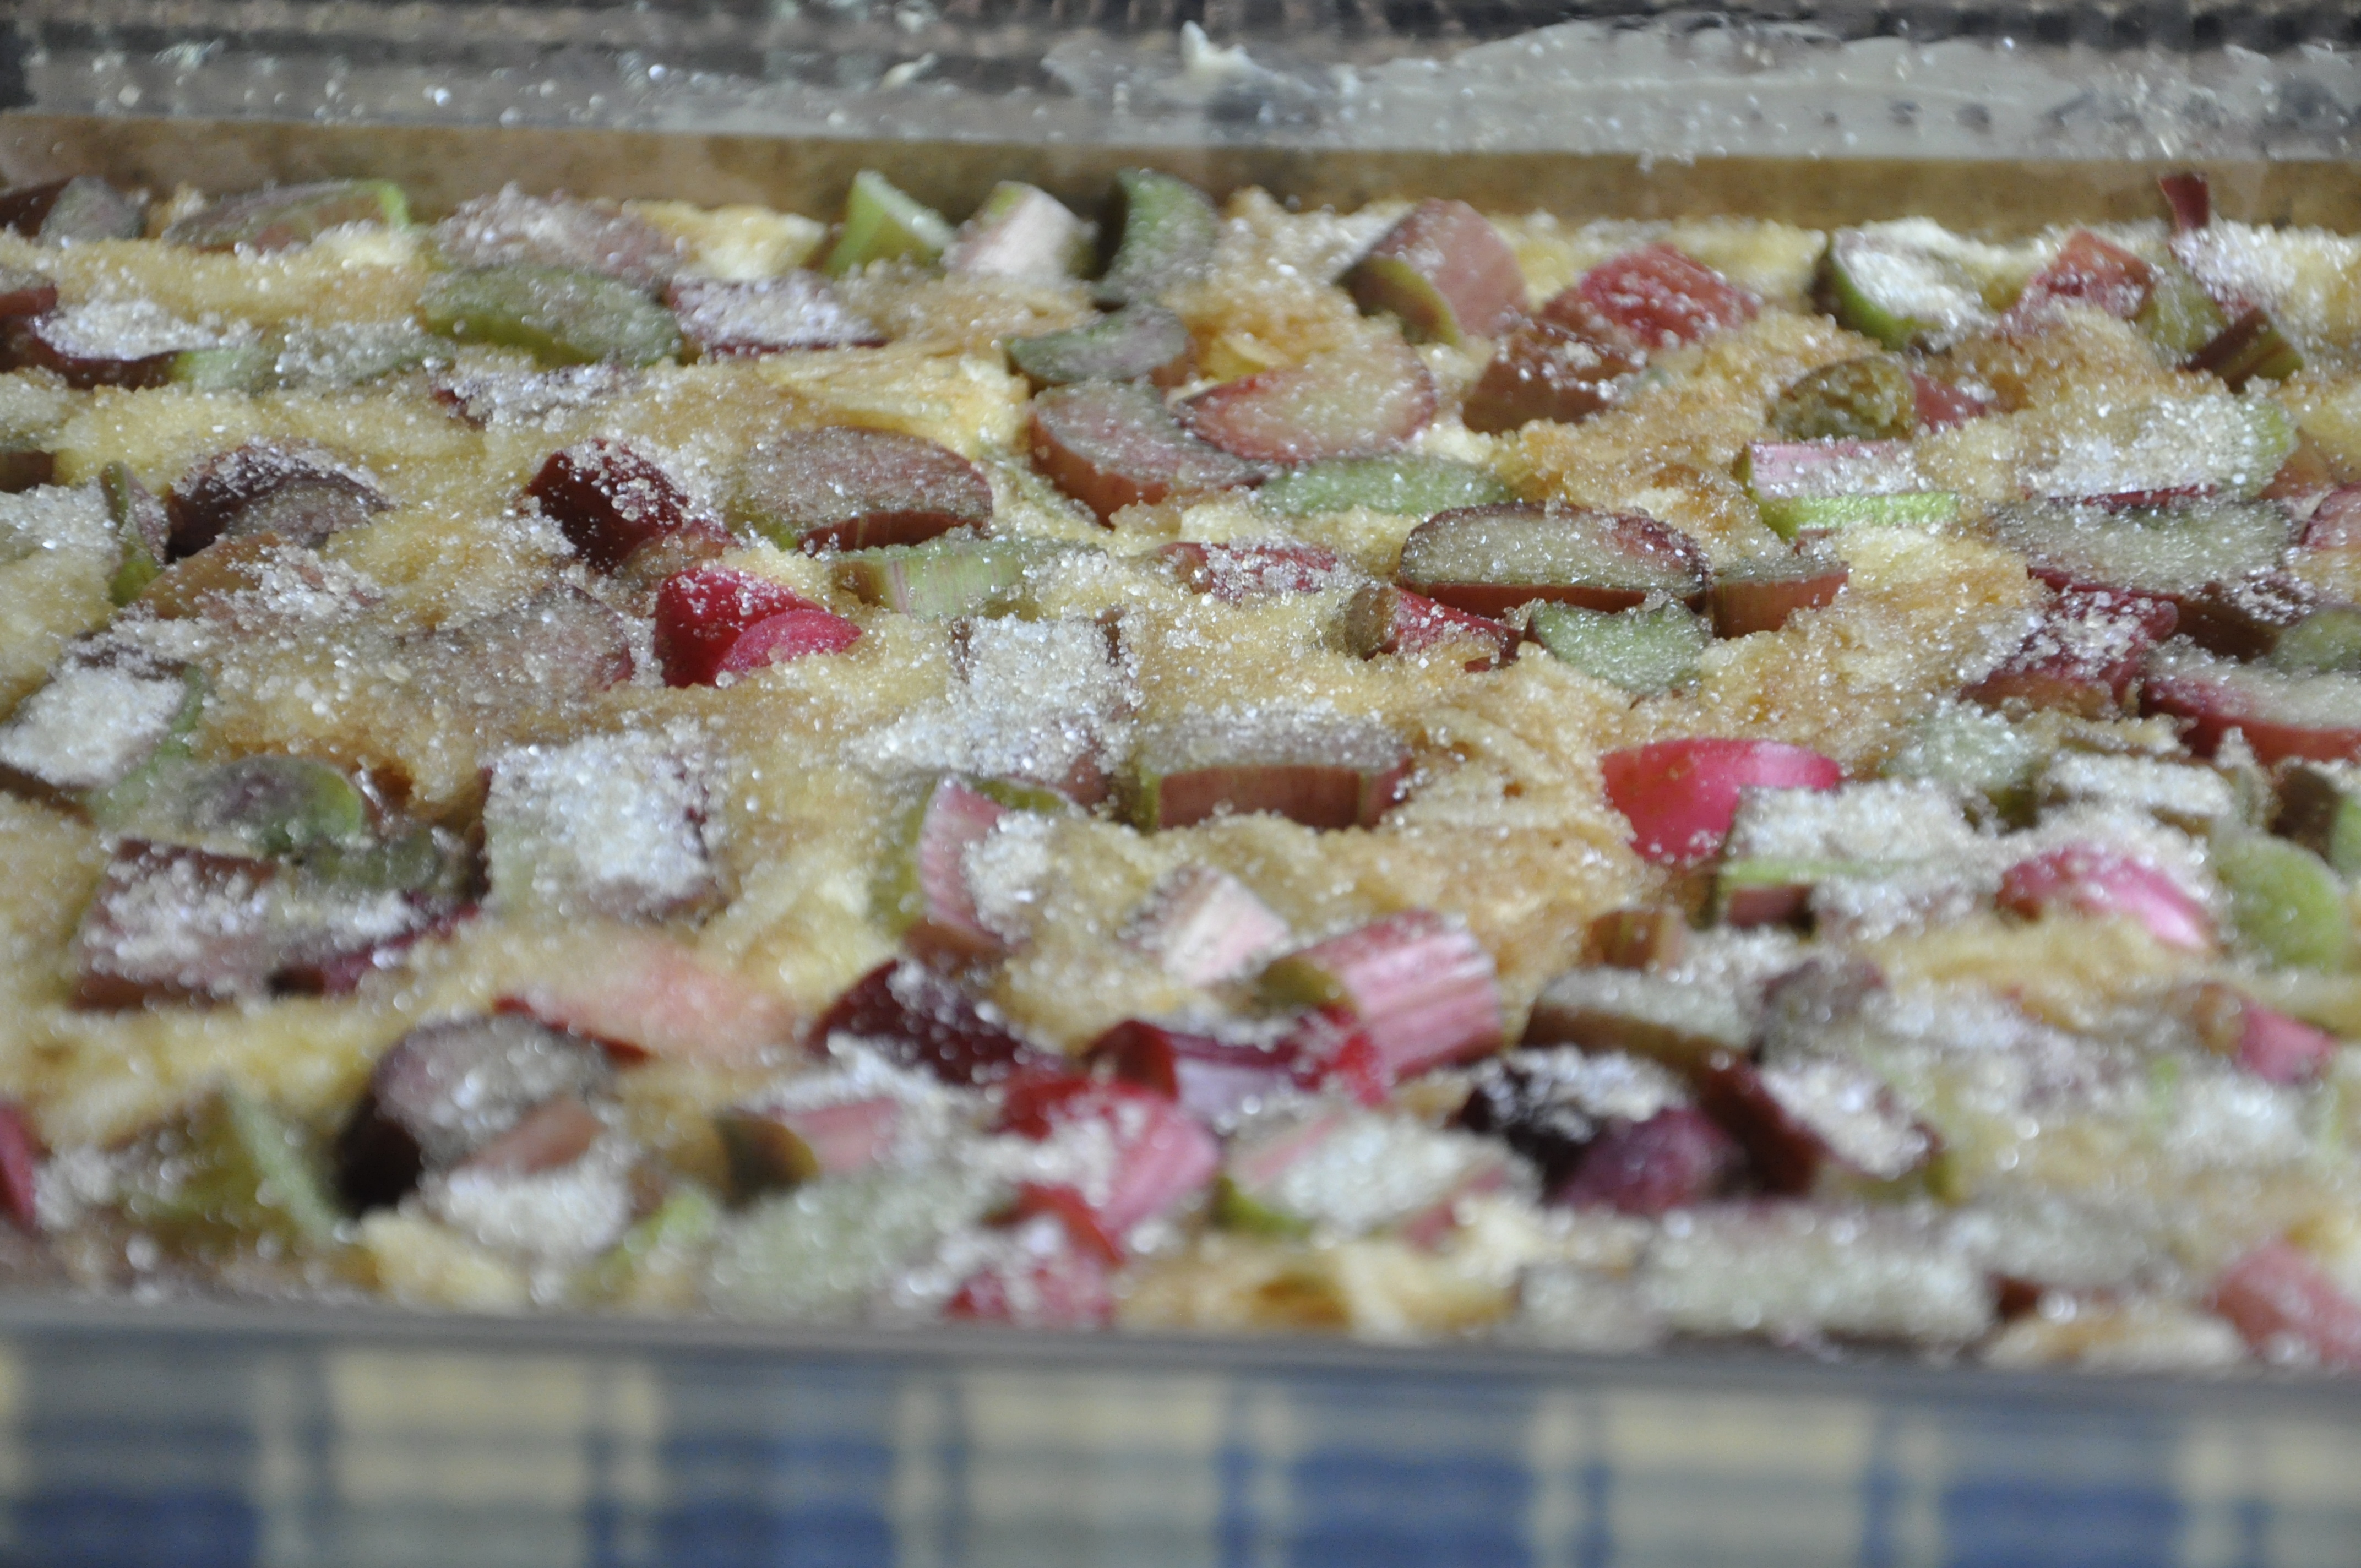 Ucierane ciasto z rabarbarem i jabłkami